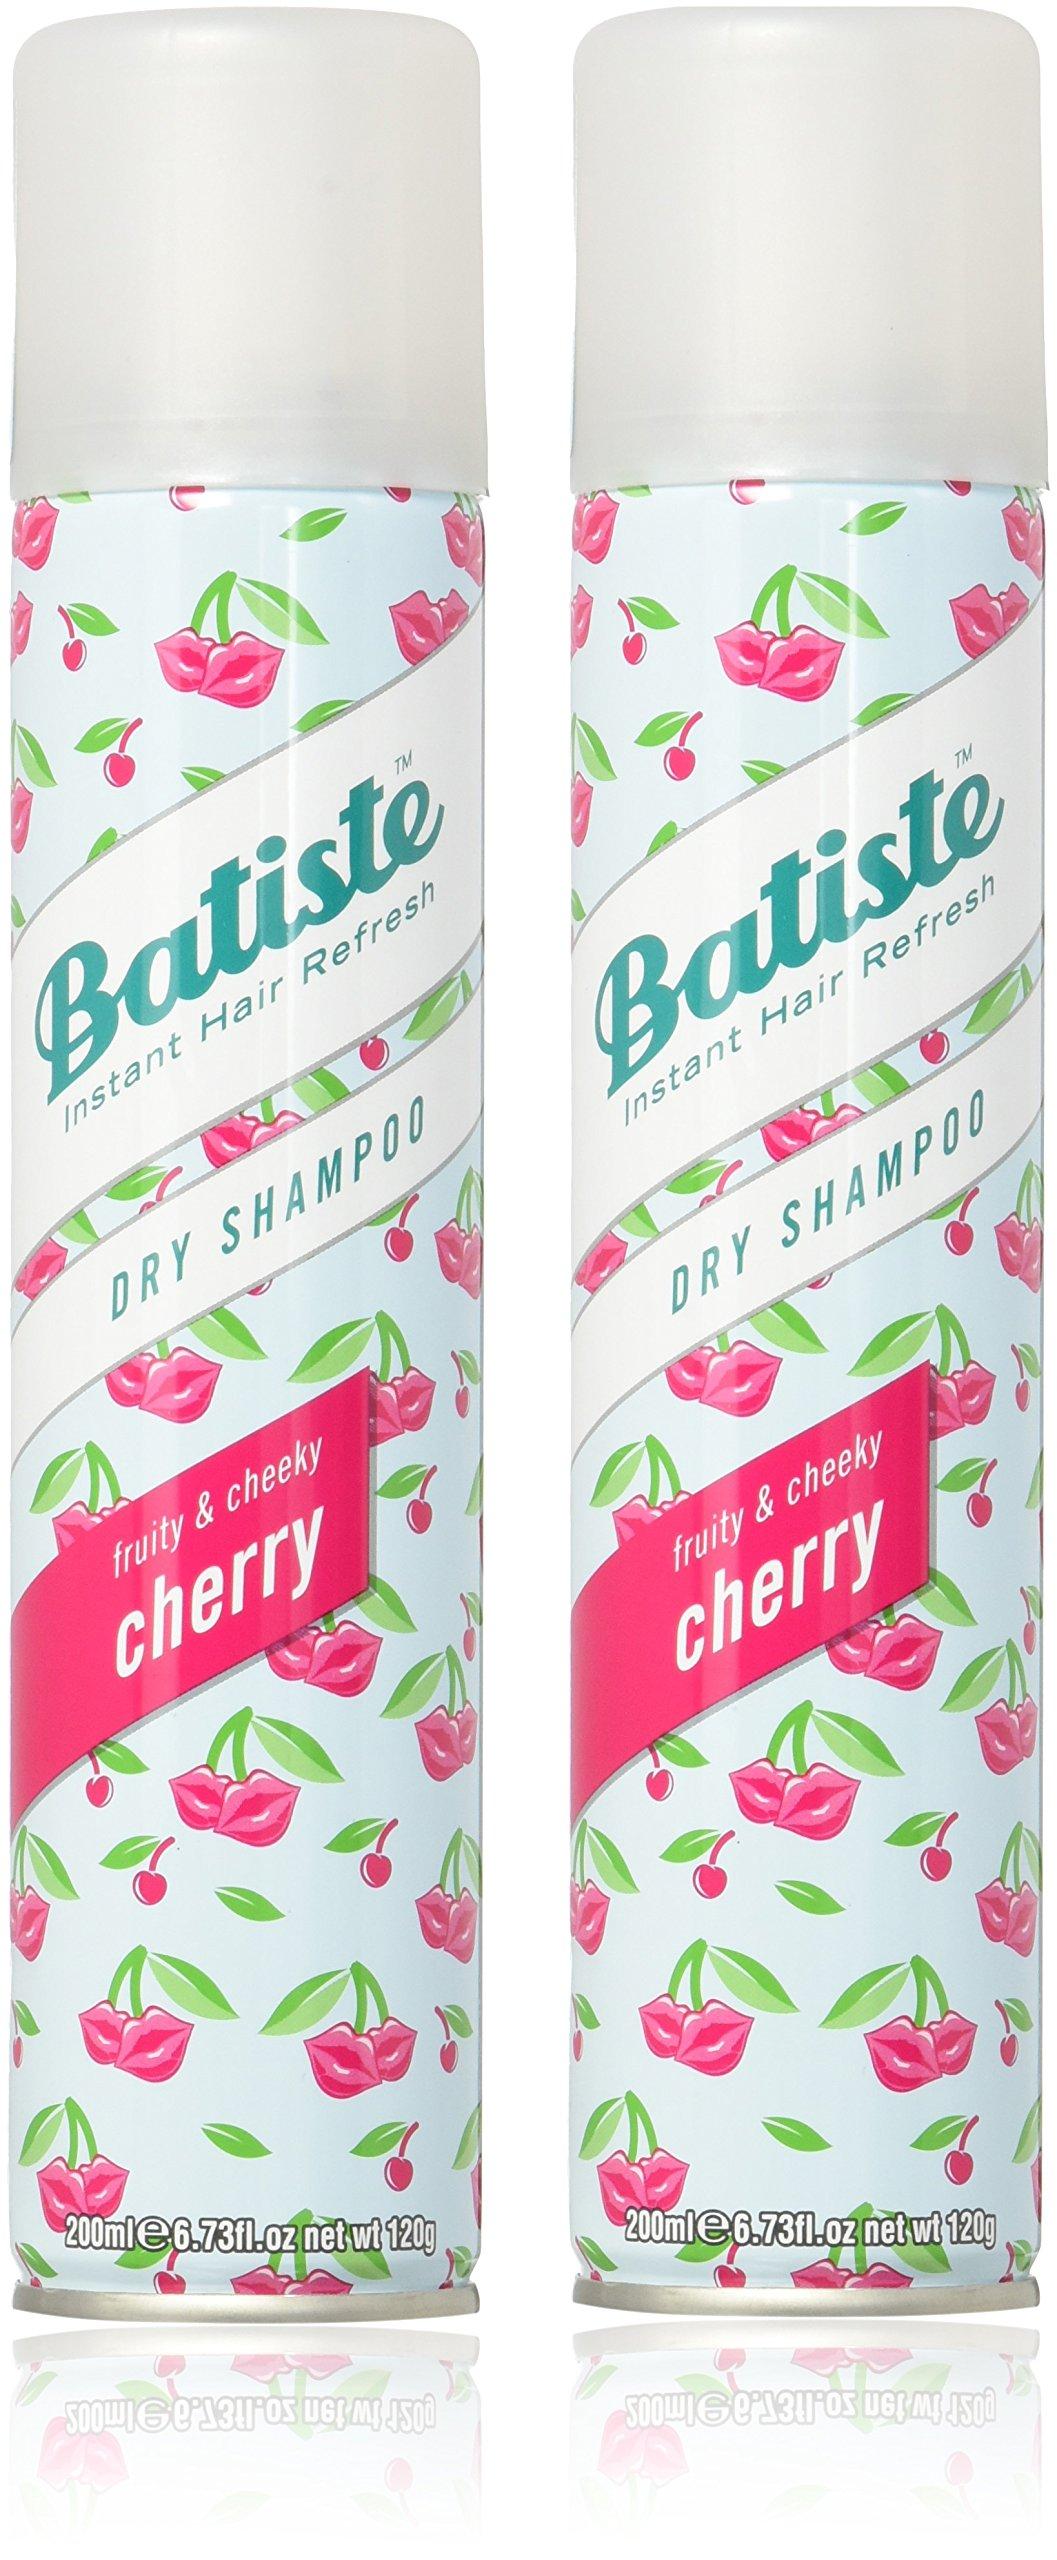 Batiste Dry Shampoo, Cherry, 6.73 Ounce (2 Pack)